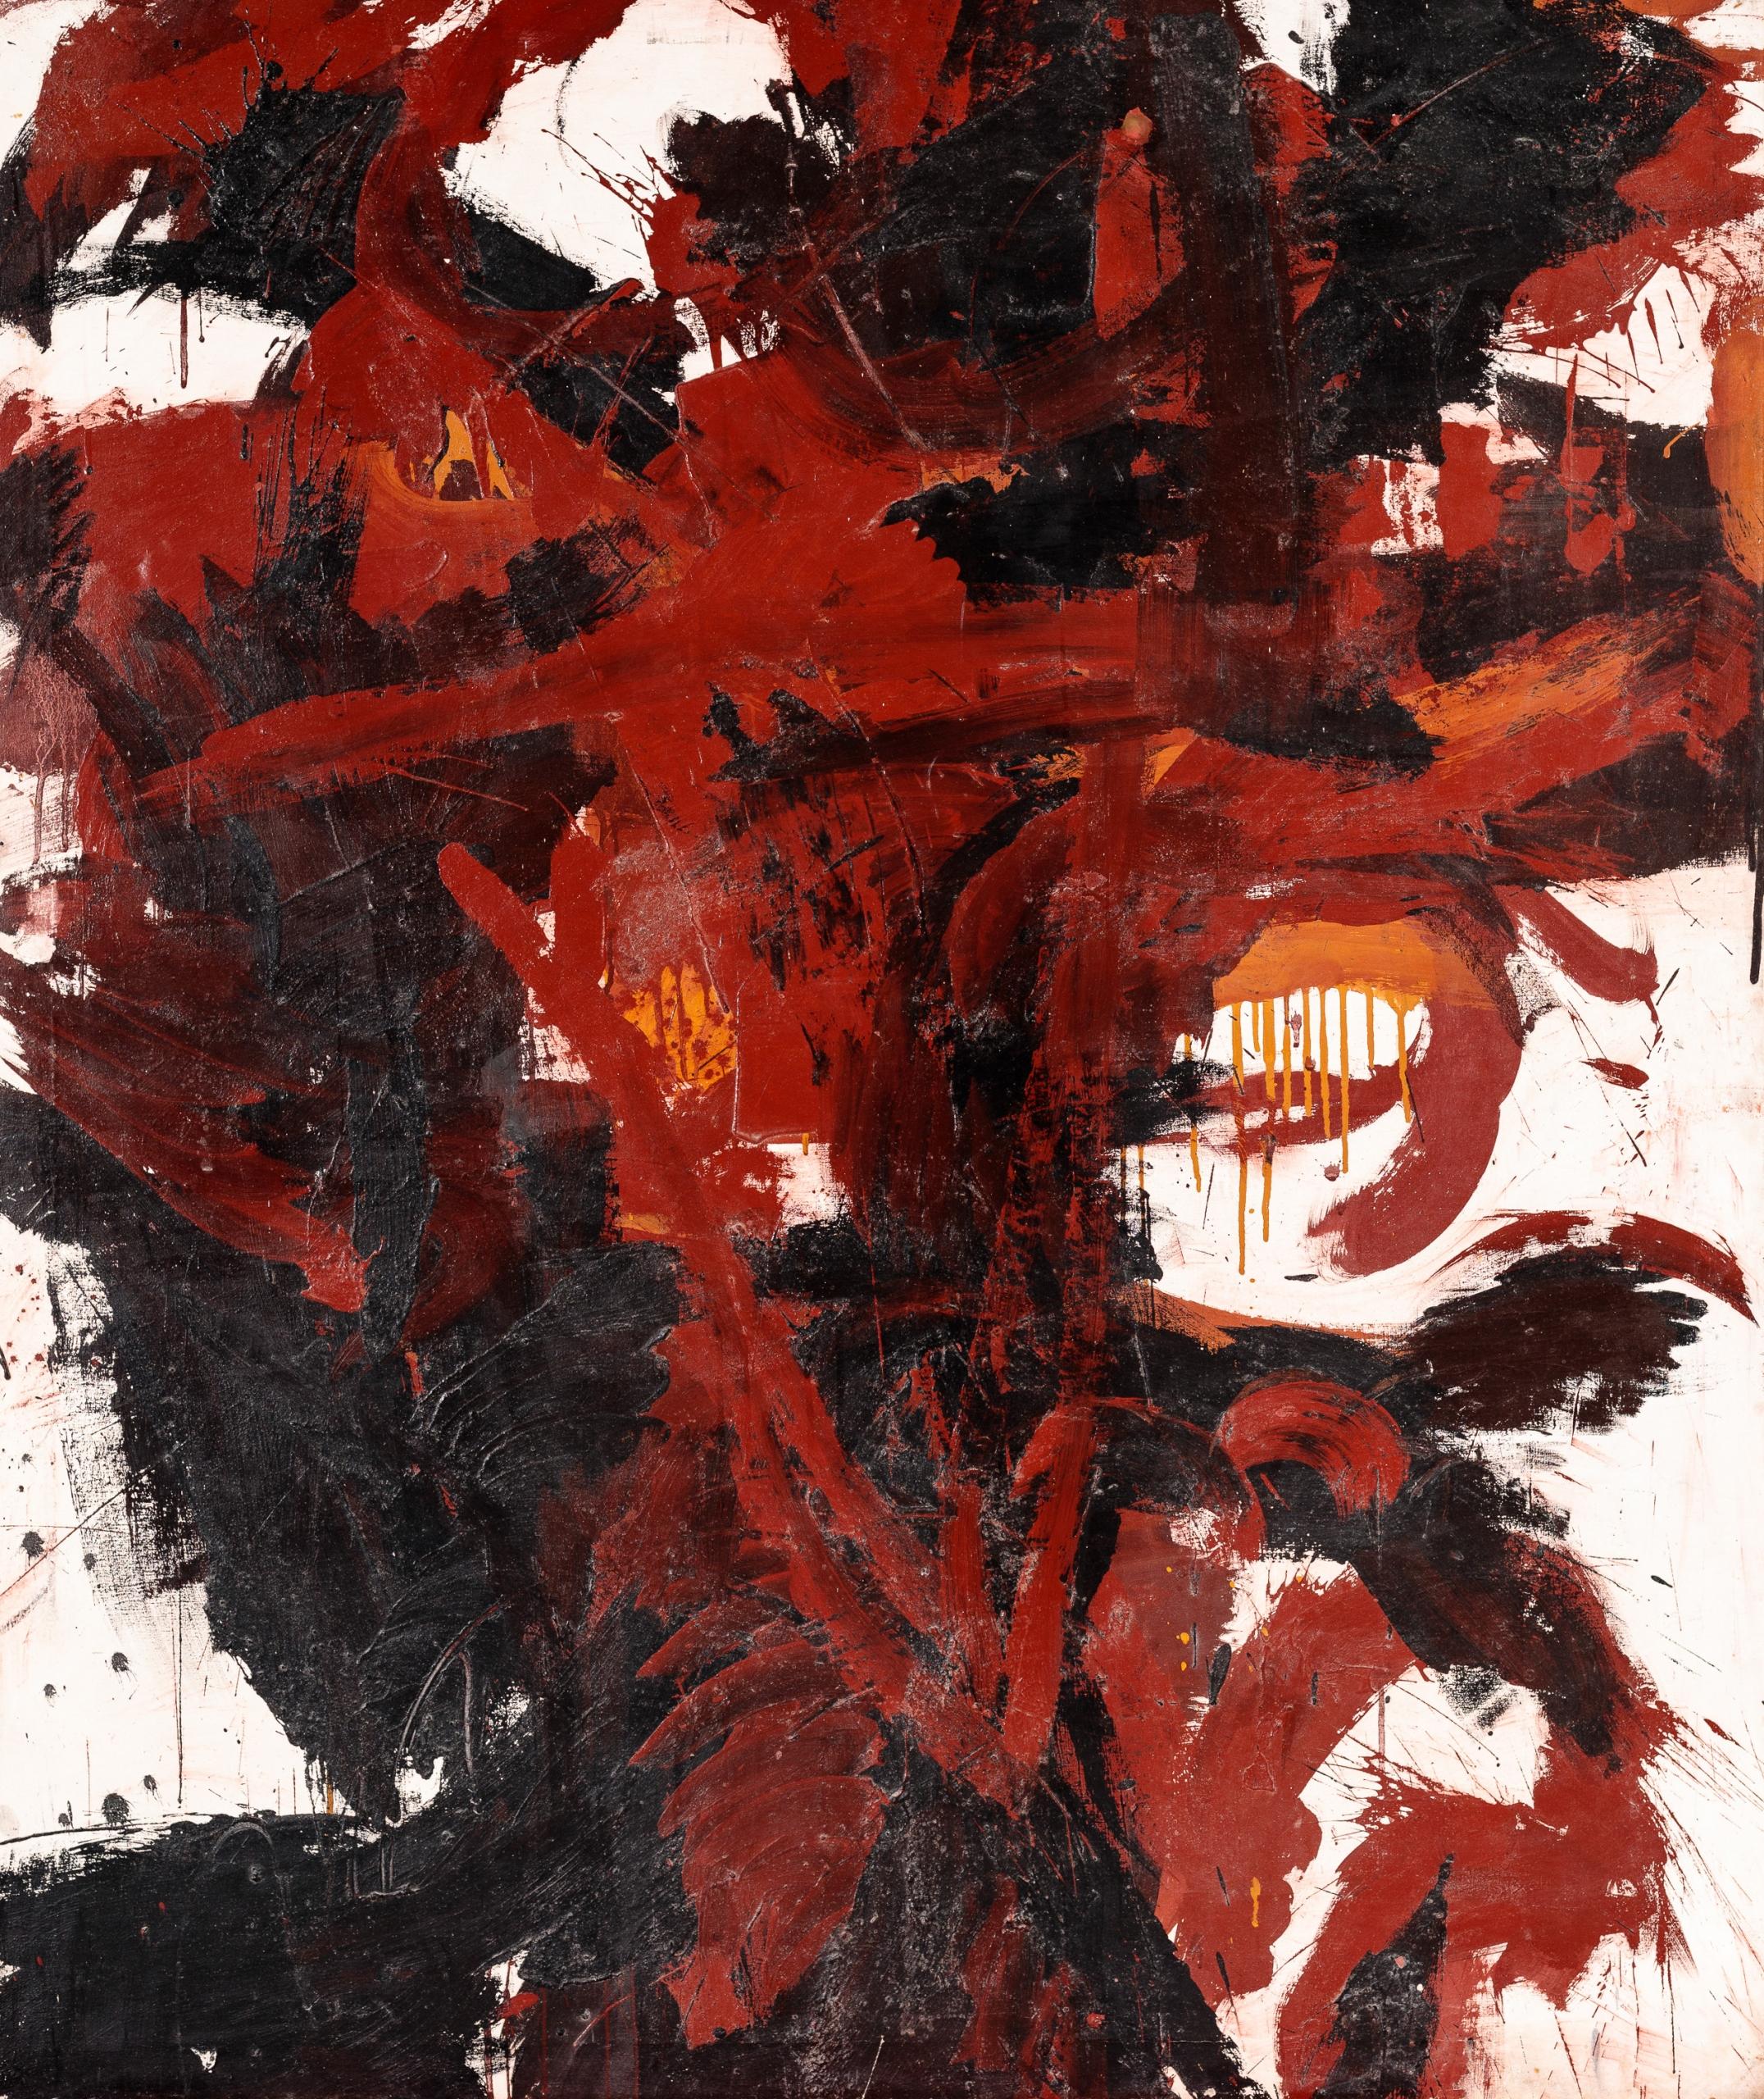 Adolf Frohner, Ohne Titel / untitled